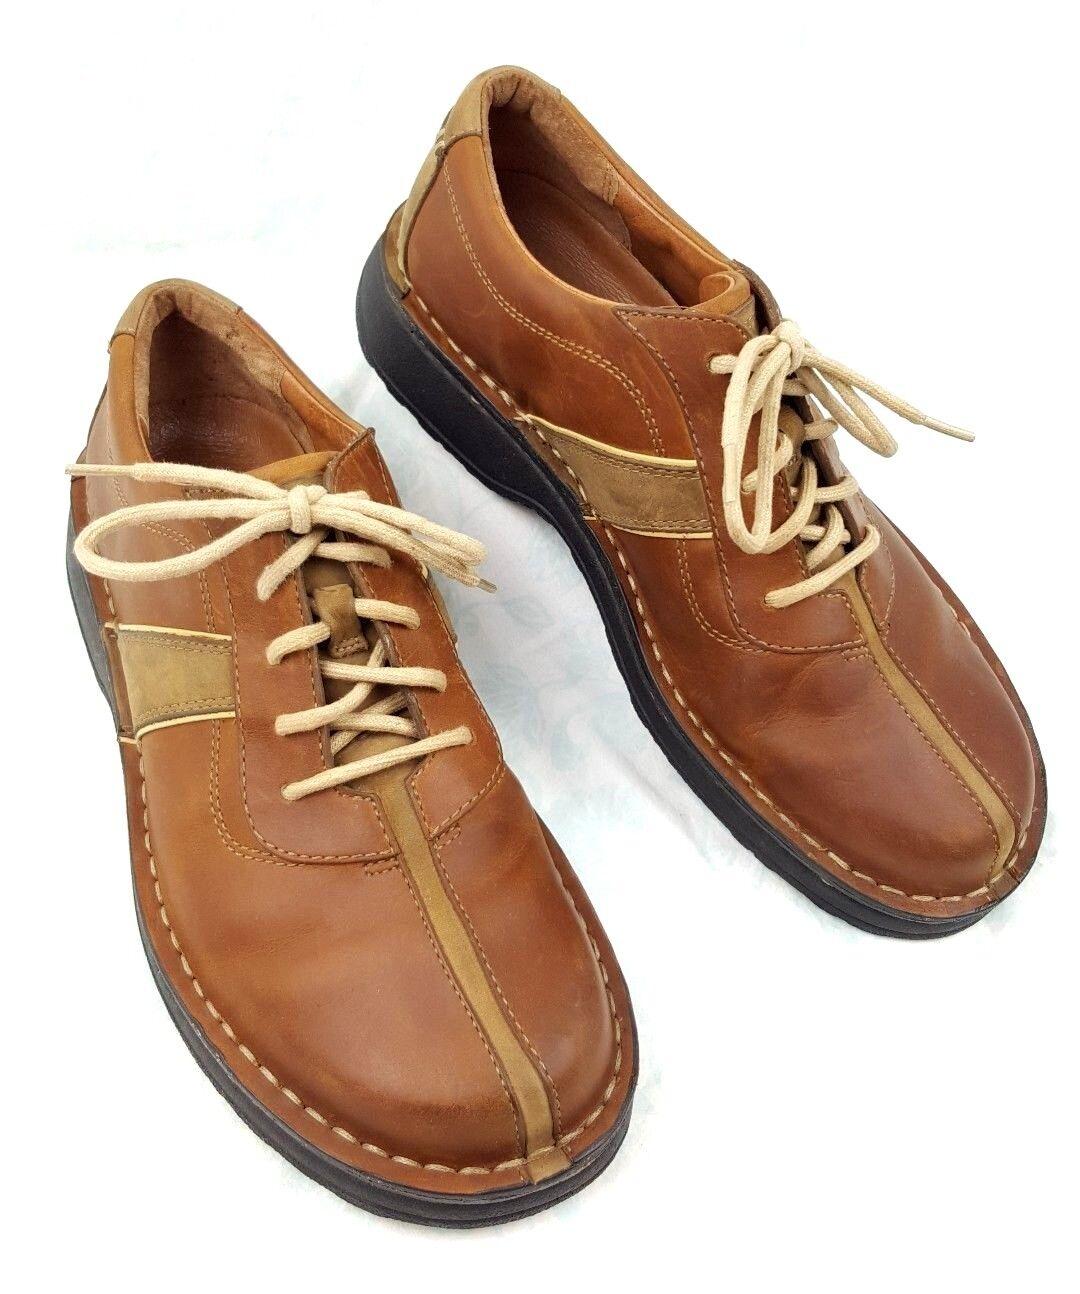 Clarks Active Brown Leather Oxford Split Toe Lace Up Casual shoes Men's Sz 7.5M